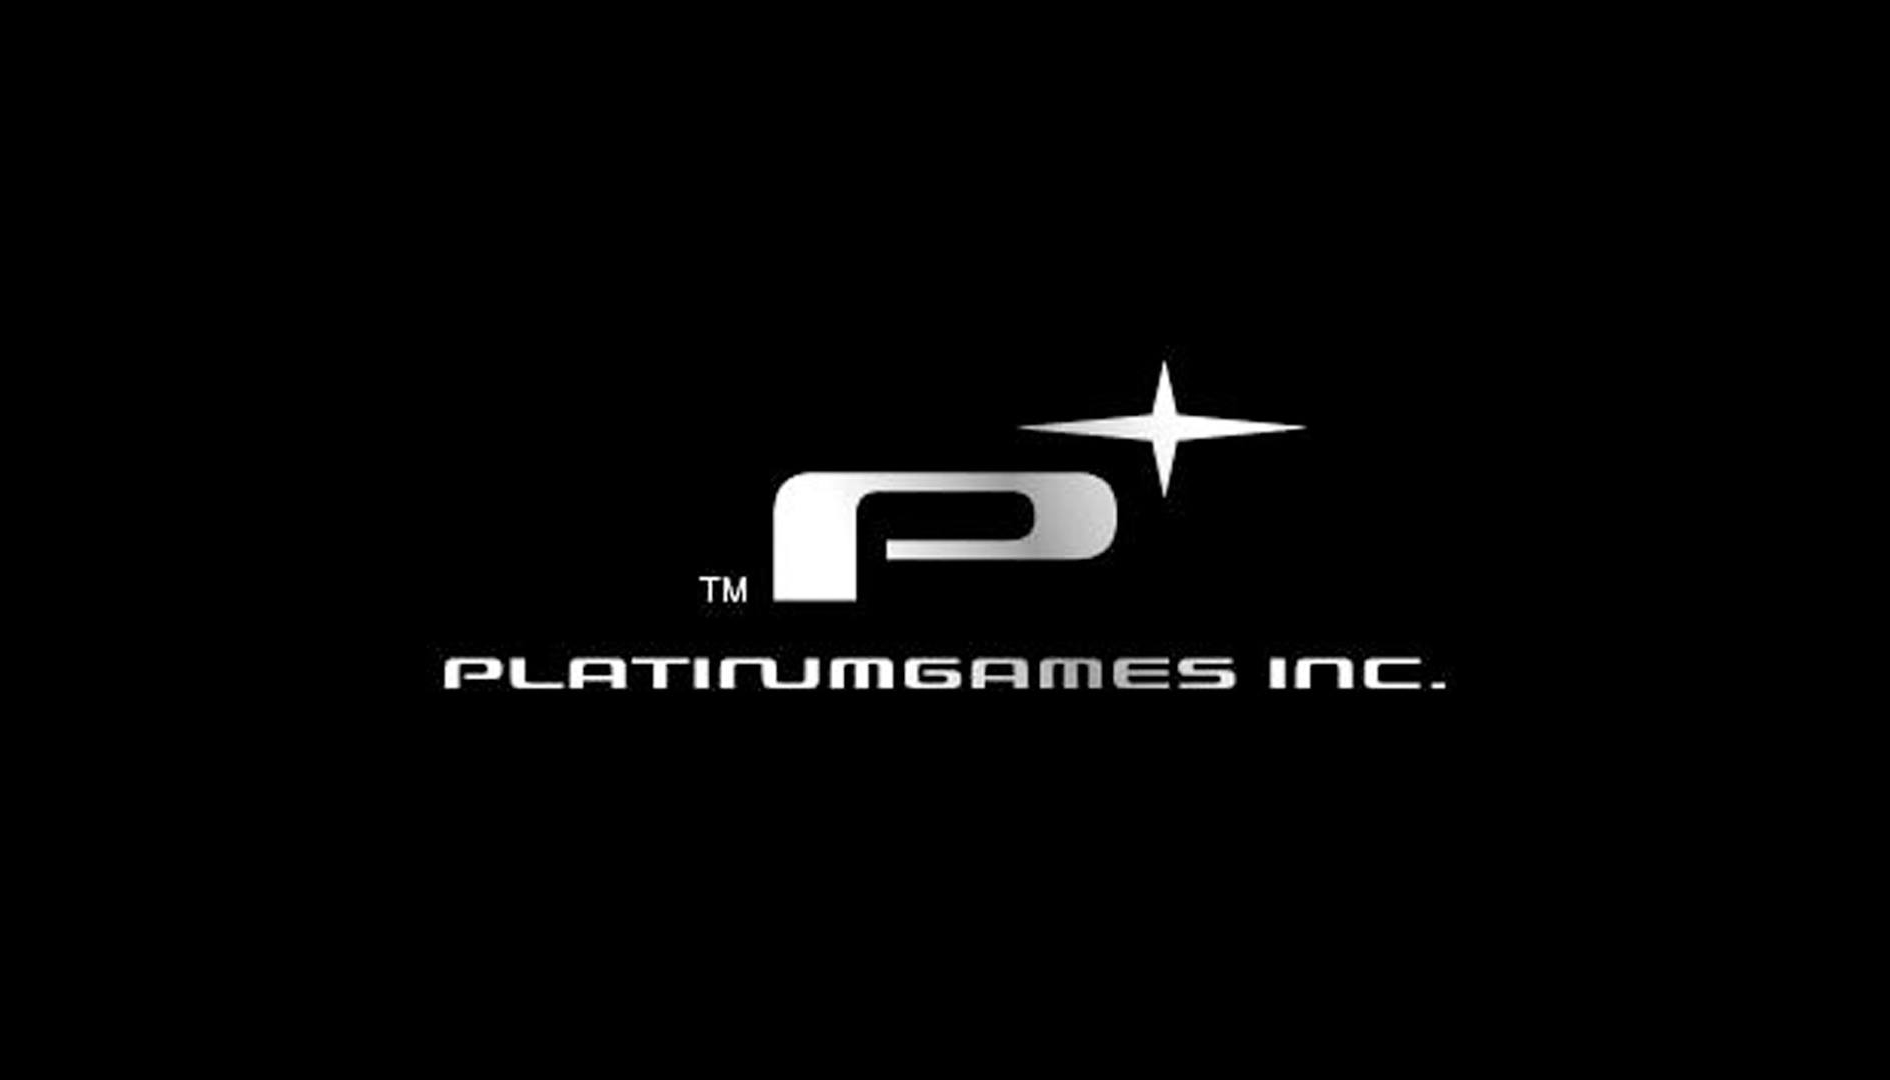 Platinum Games annuncia una partnership con Tencent